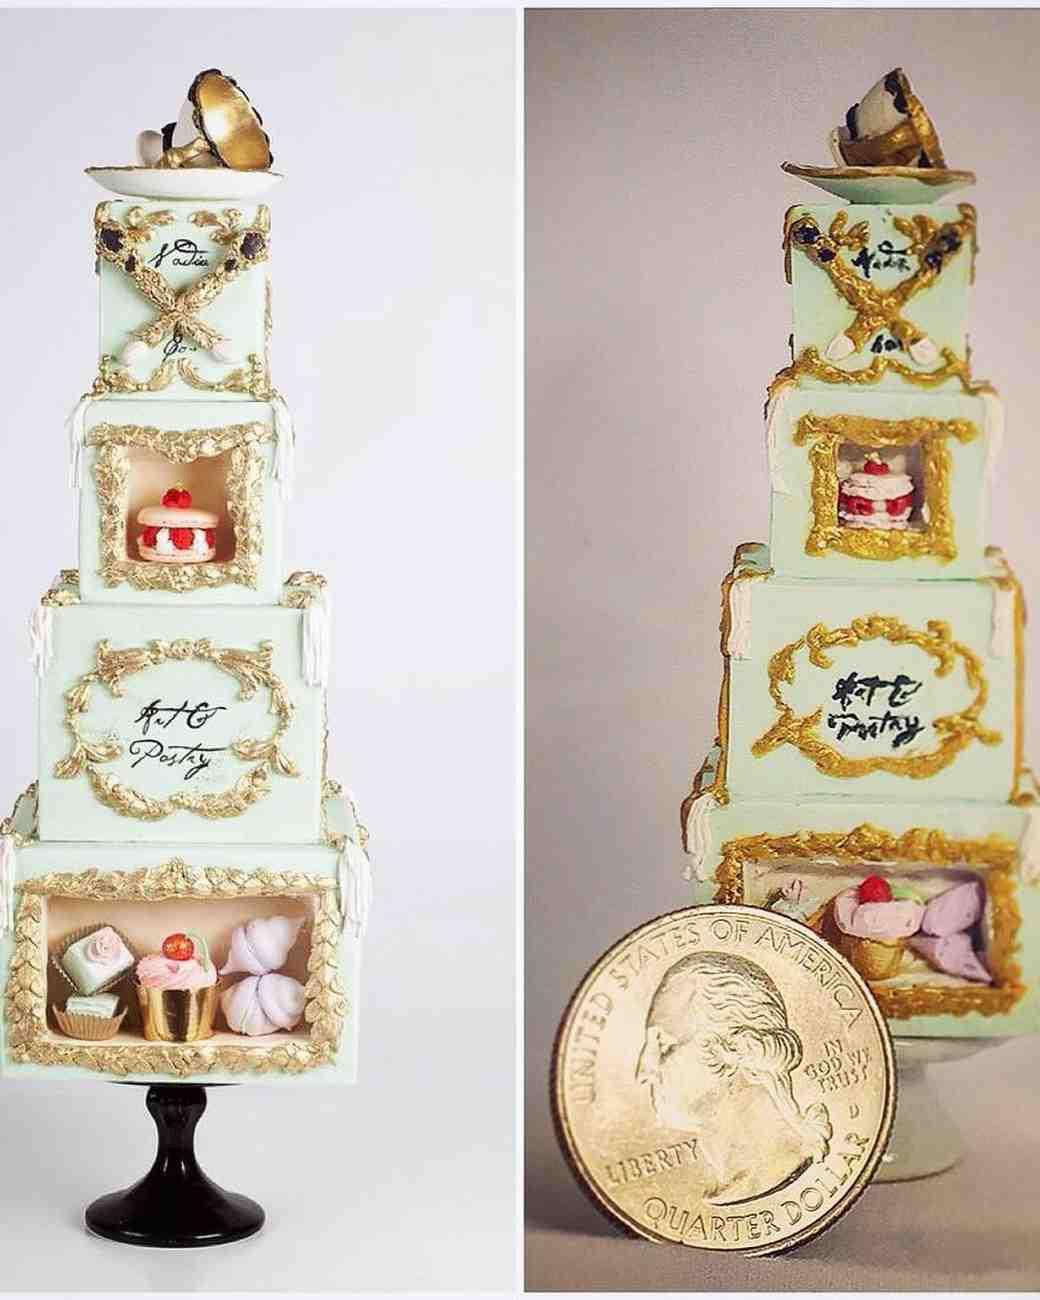 mini cake ornate